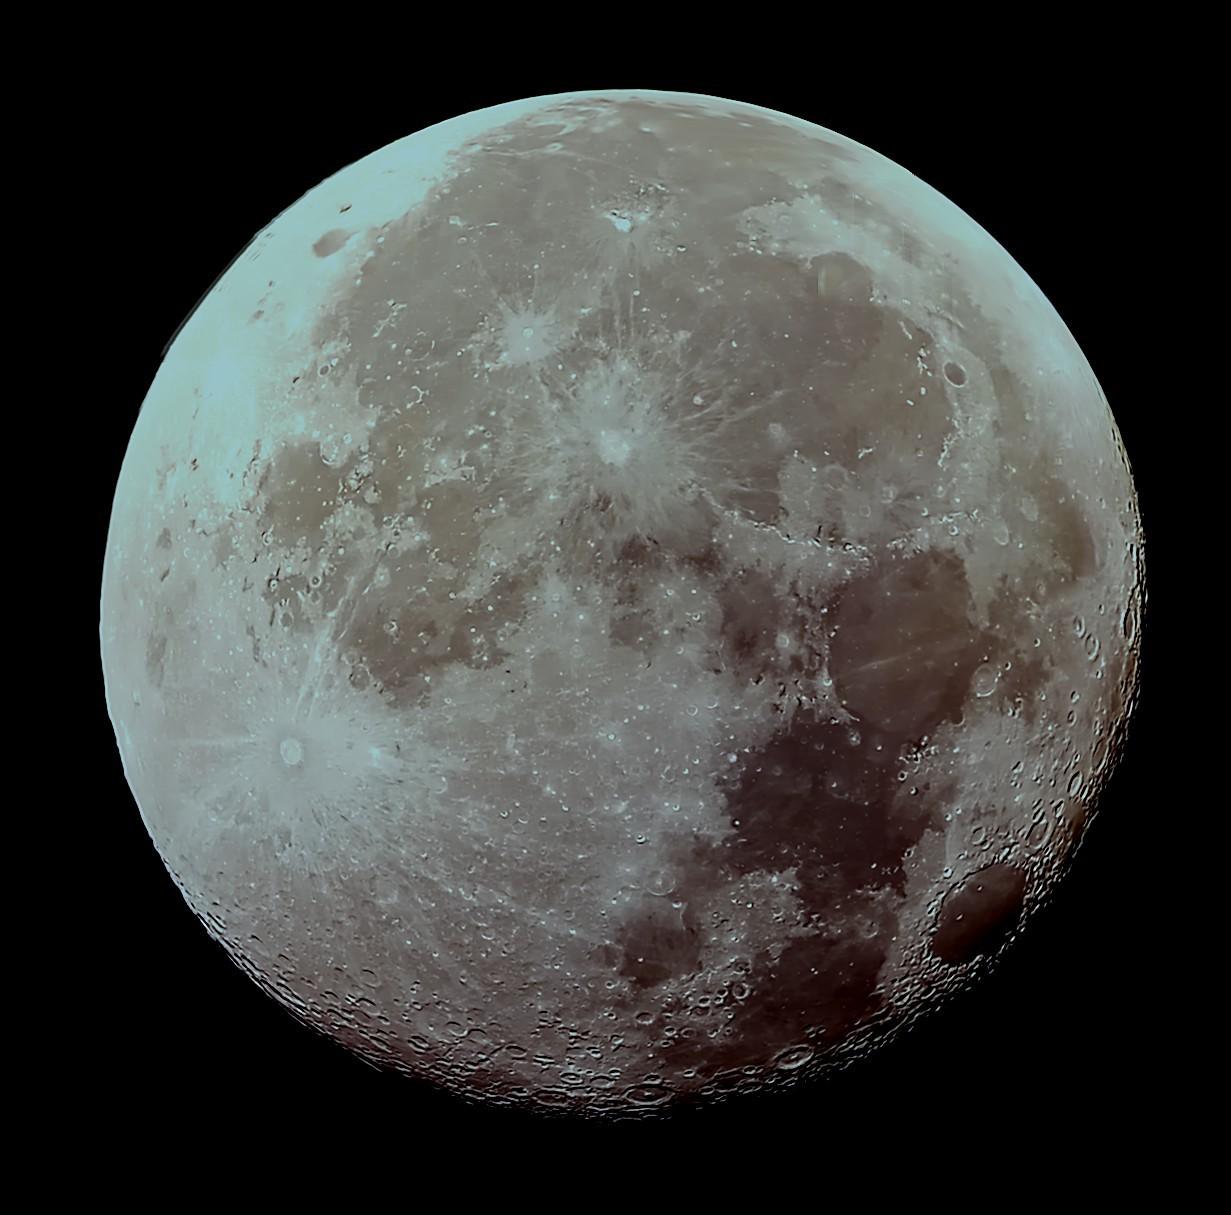 Moon_afokal_LG5.jpg.e4a8808e1c01cf8835c5c301b13258ce.jpg